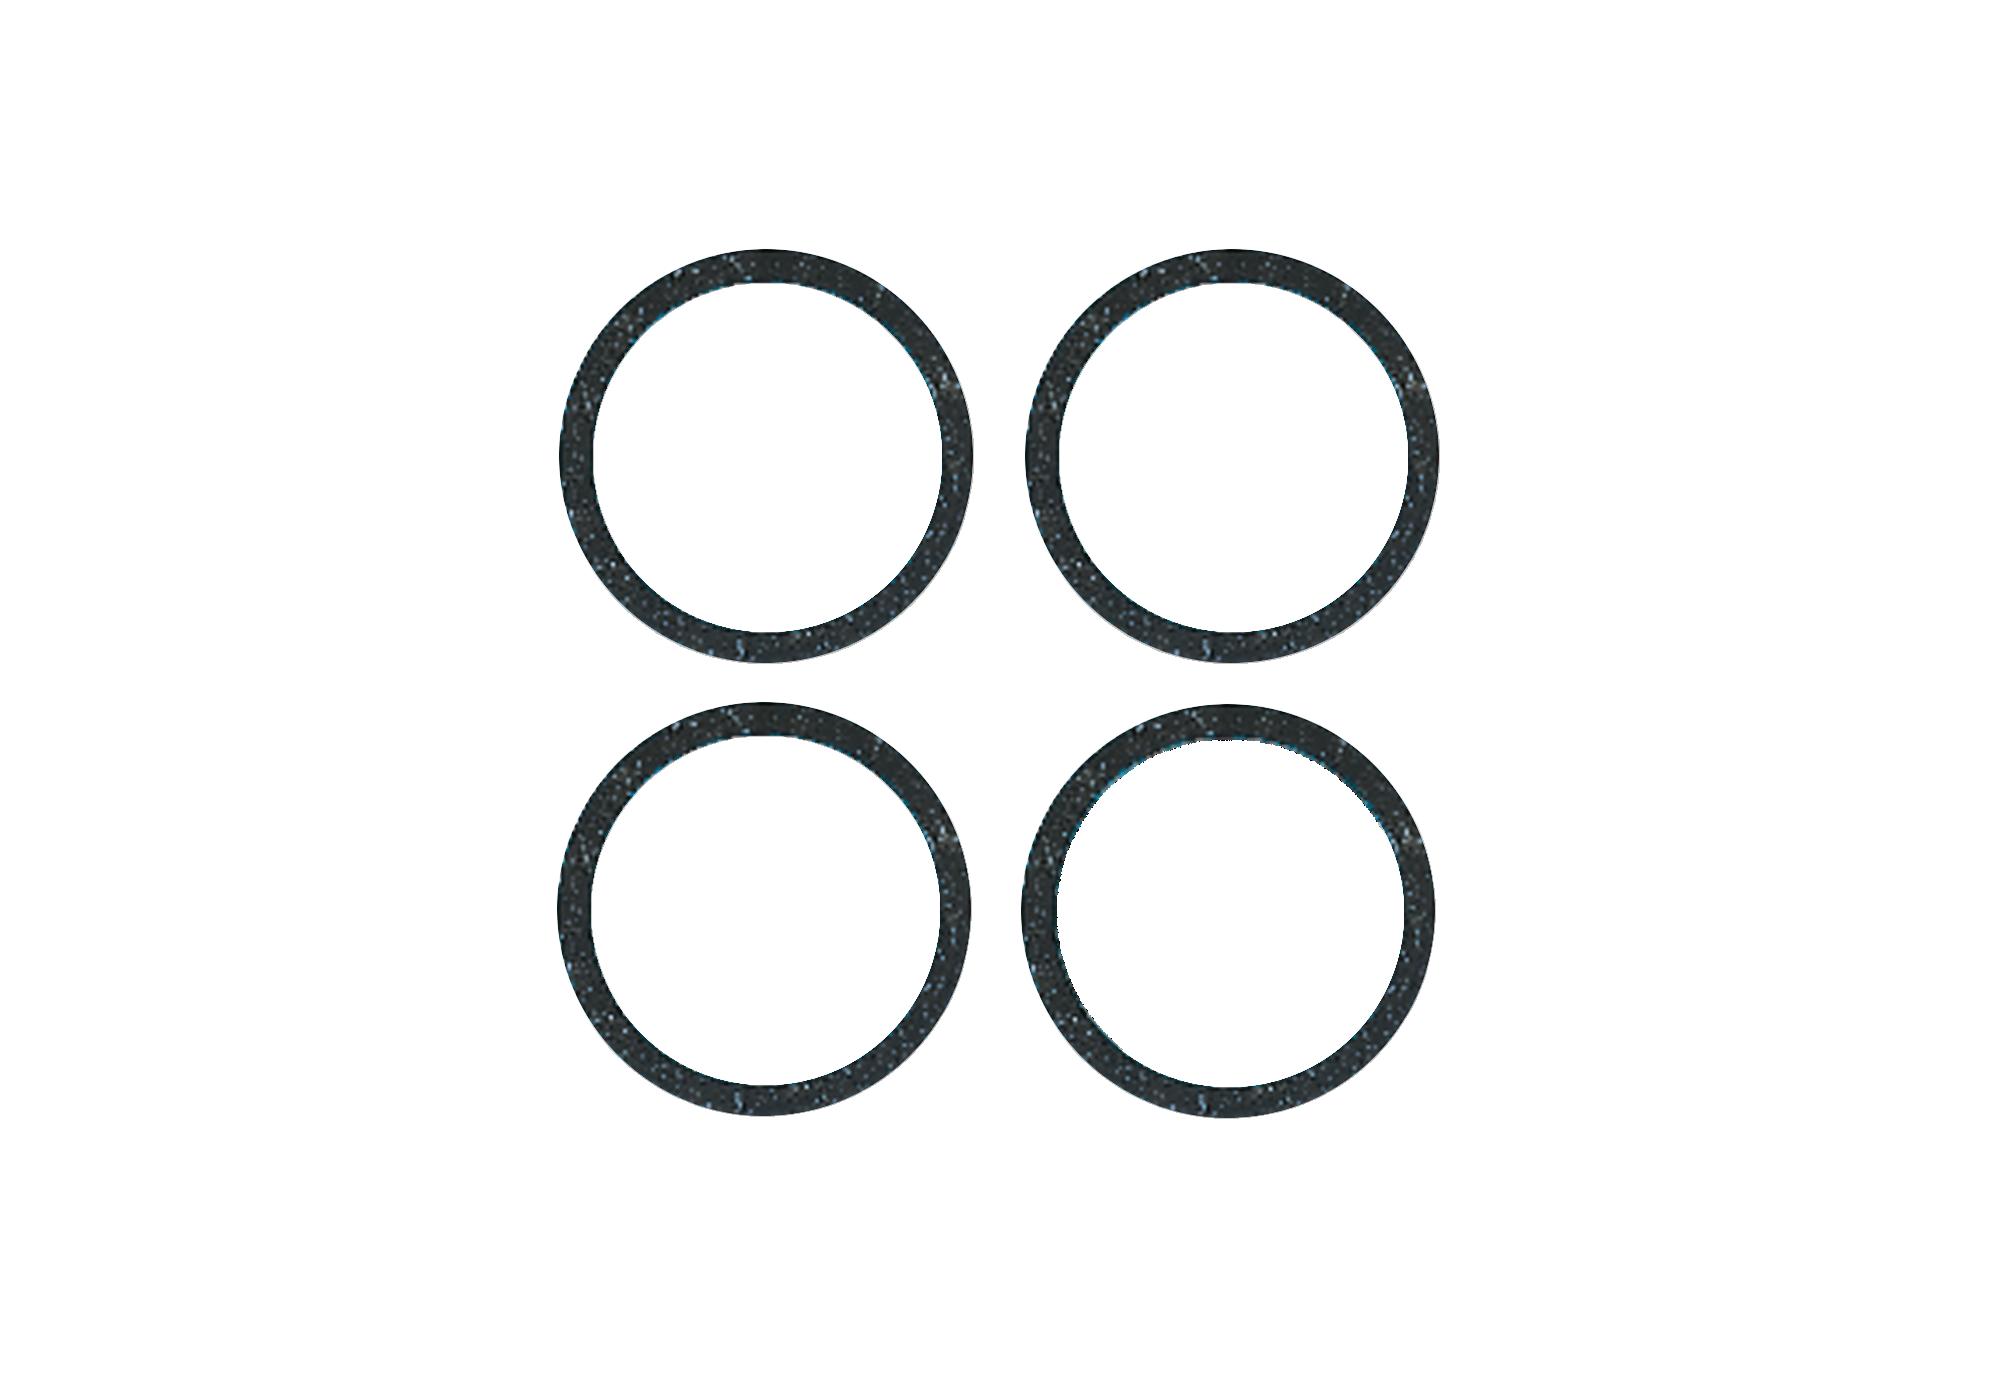 http://media.playmobil.com/i/playmobil/7231_product_detail/4 Perbunane Rings